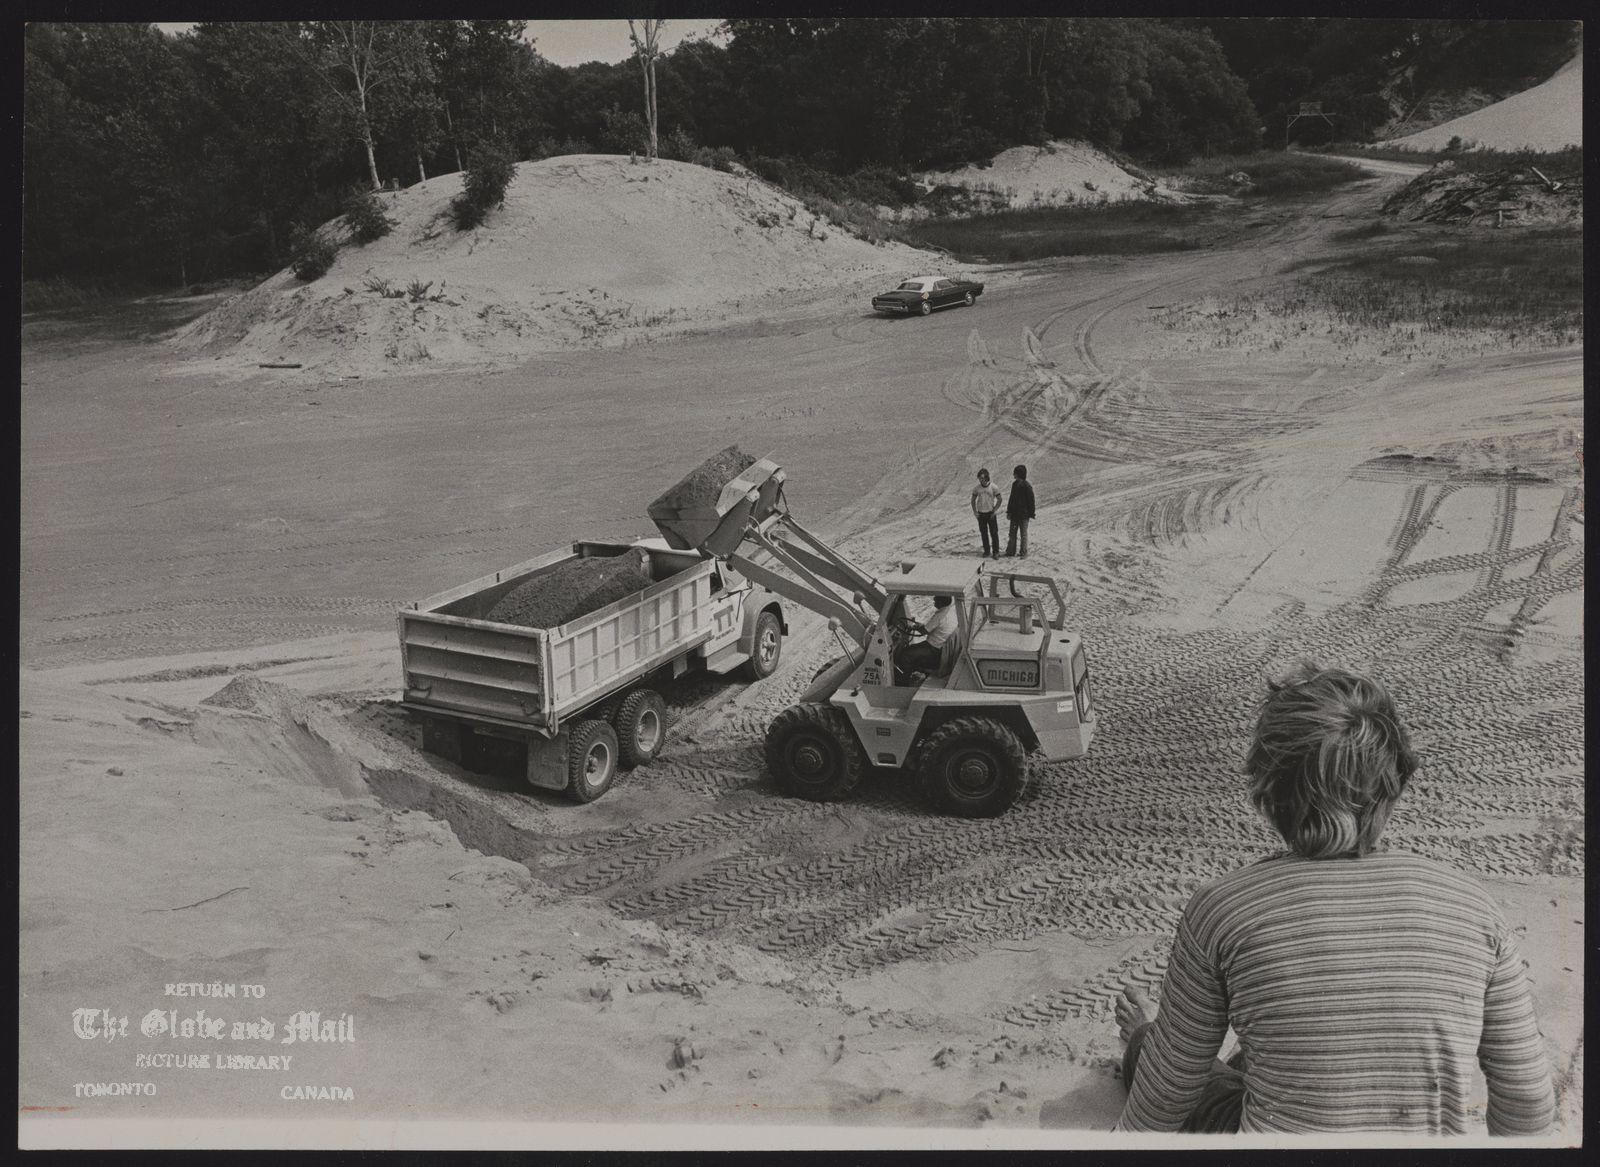 SANDBANKS PROVINCIAL PARK Ontario Front end loader fills truck with sand used forcement